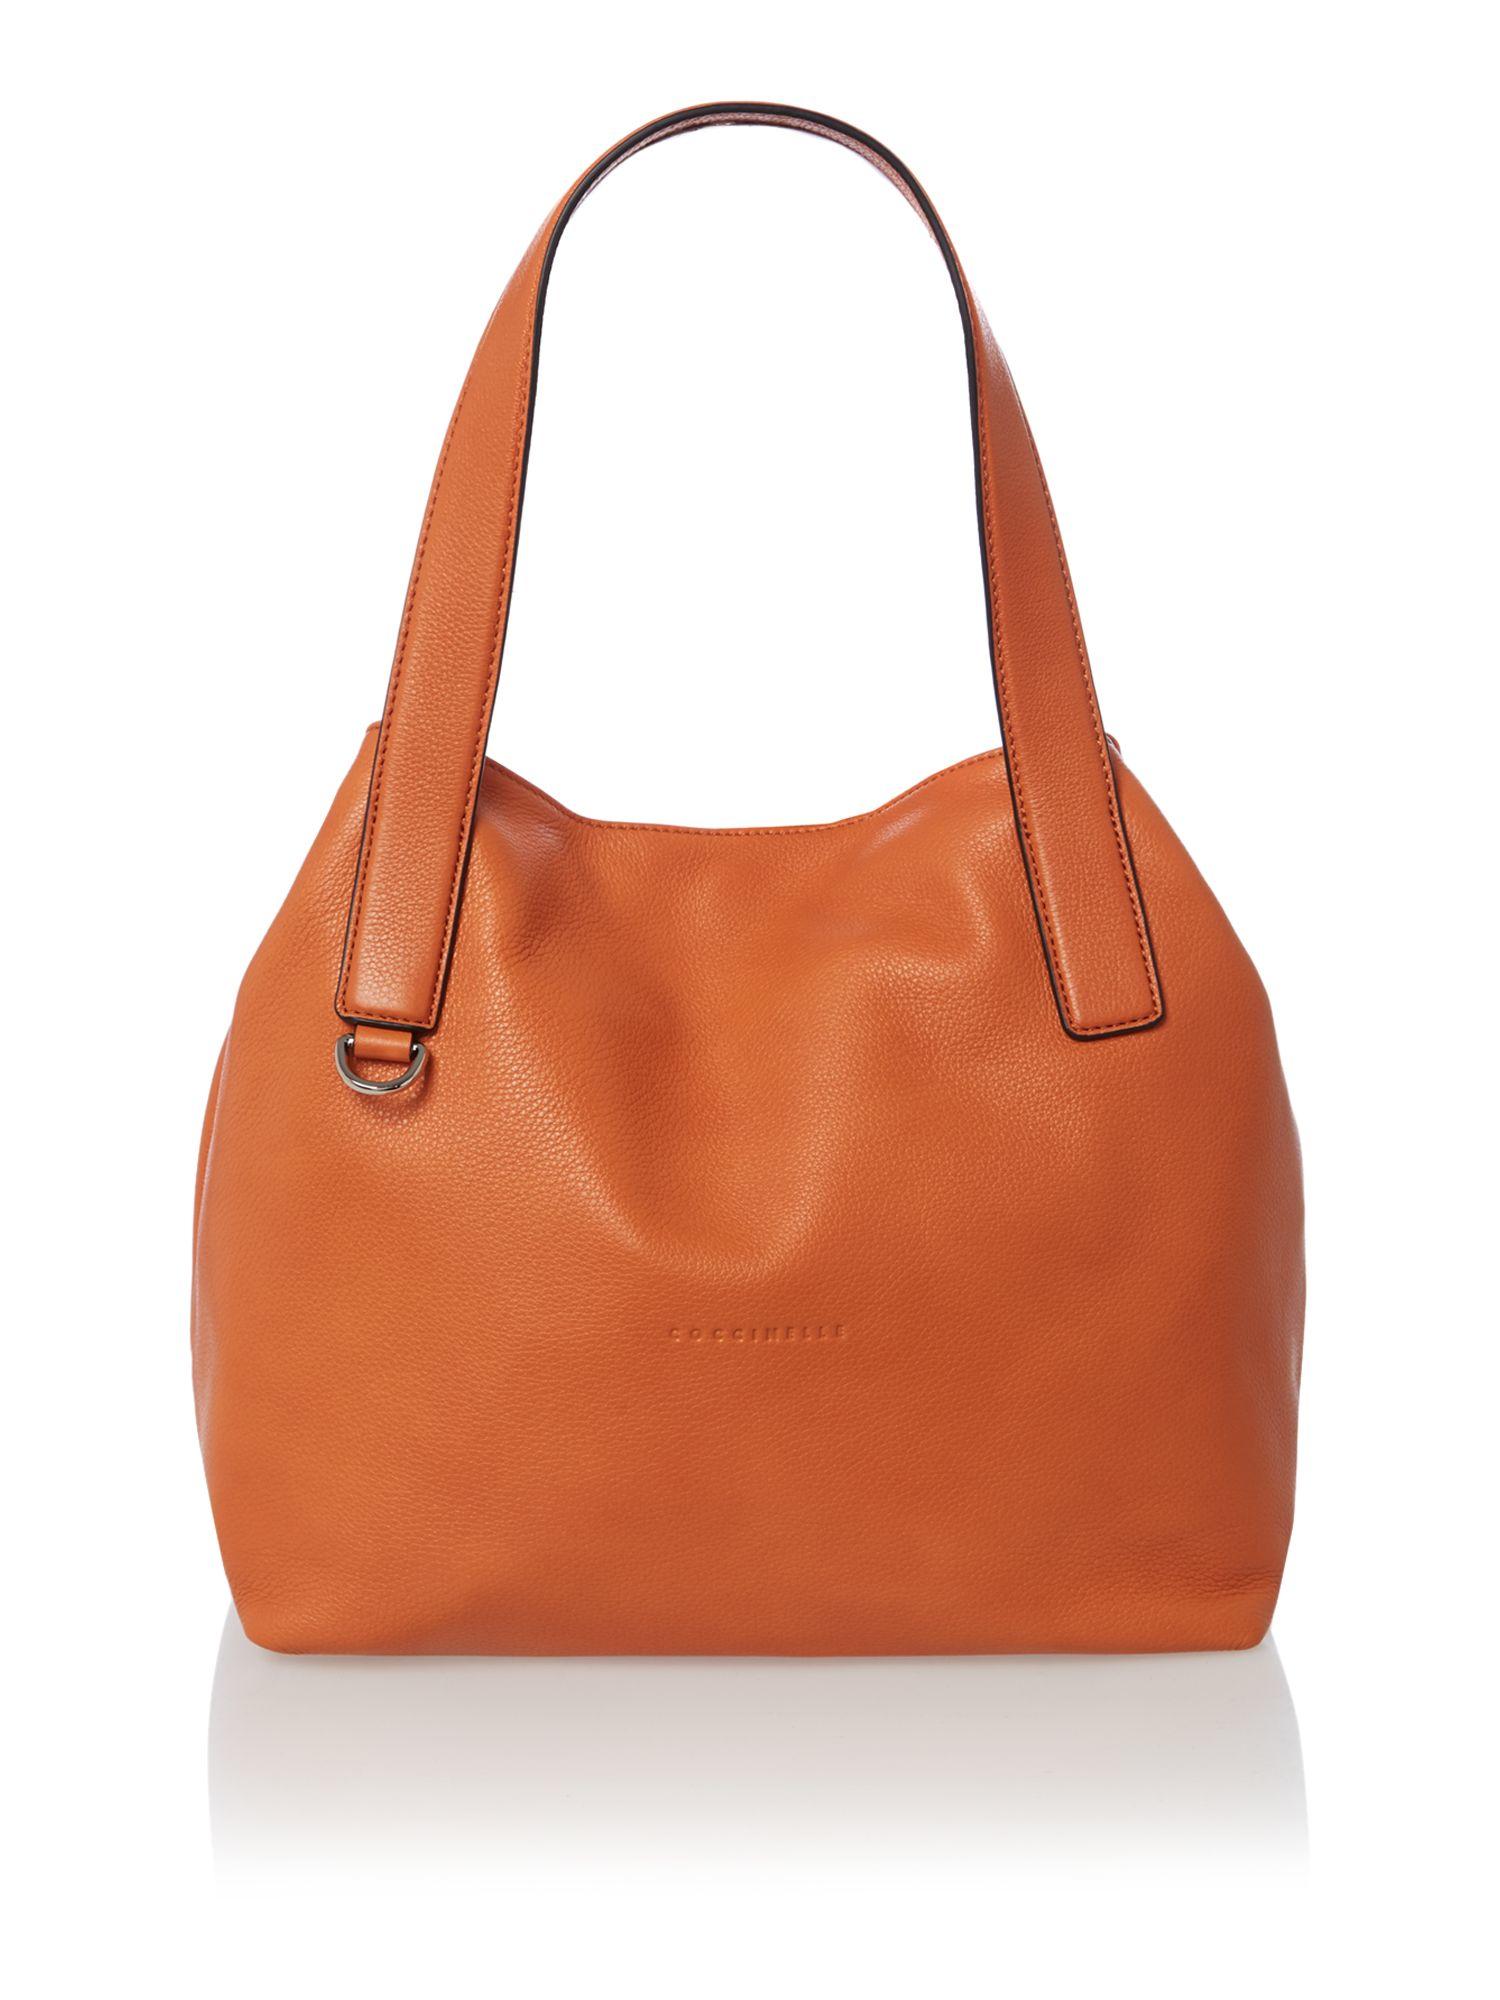 Coccinelle Orange Hobo Bag in Orange | Lyst